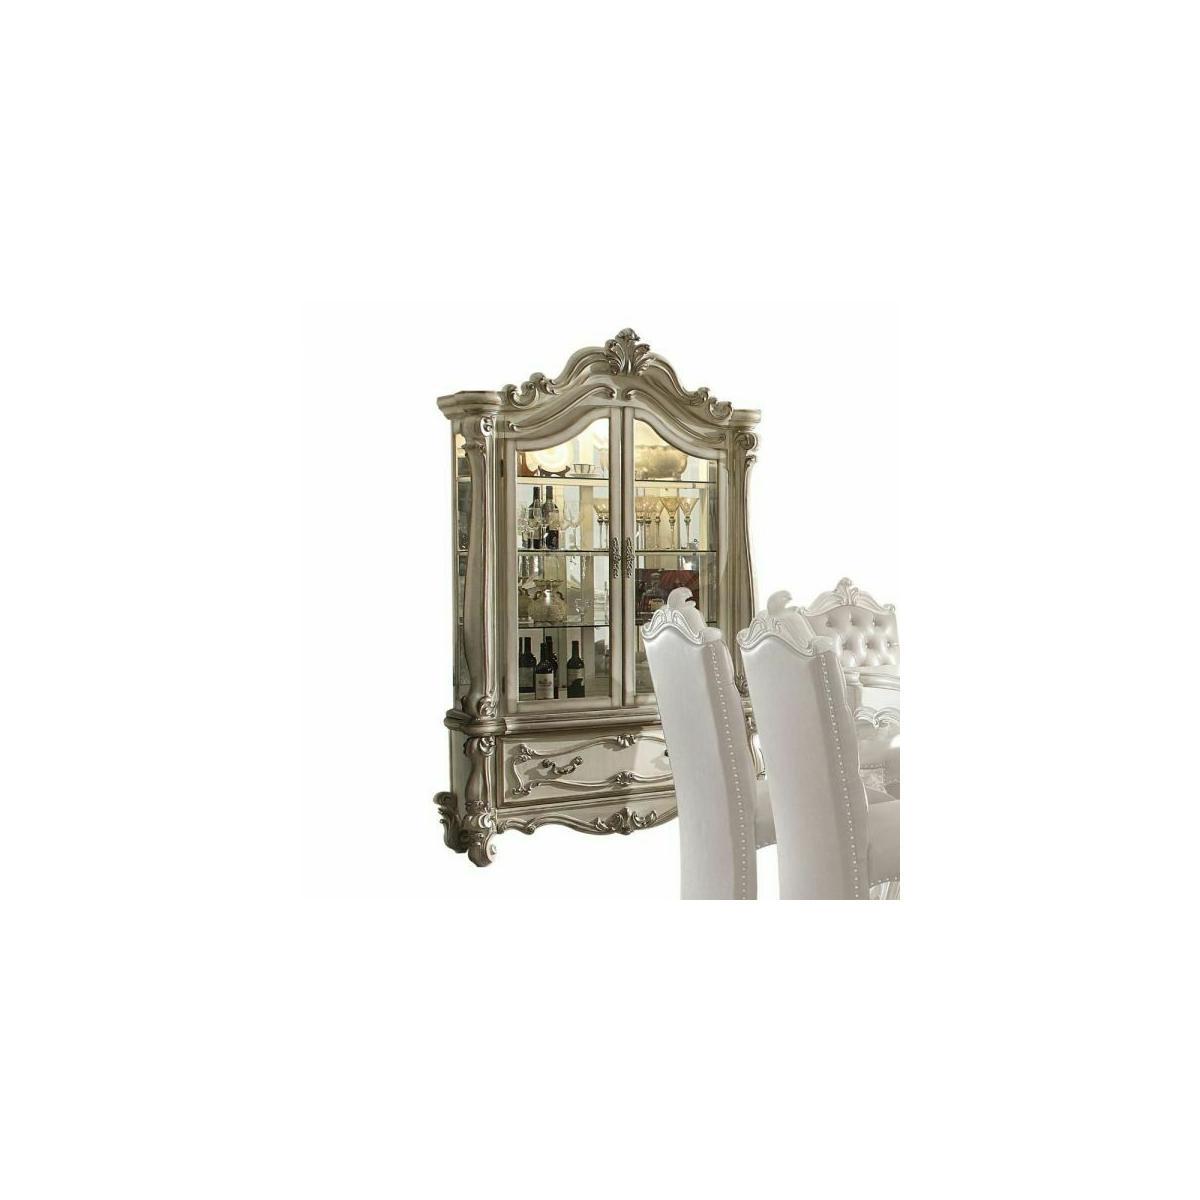 ACME Versailles Curio Cabinet - 61153 - Bone White